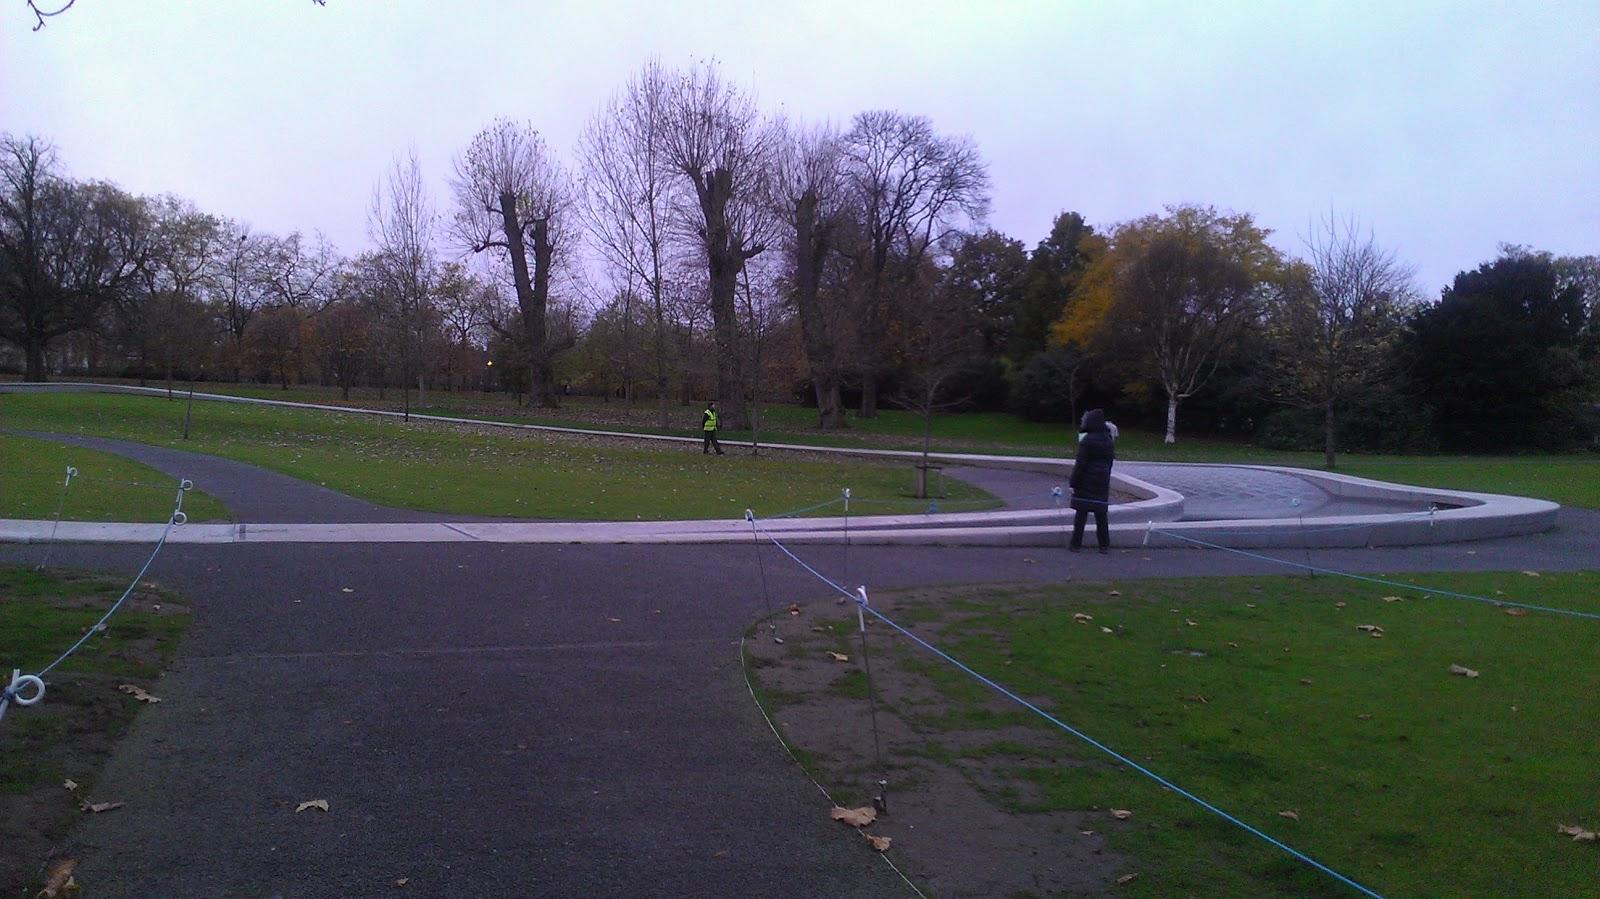 http://2.bp.blogspot.com/-fSuljmEzhCk/UKj6ay-p2cI/AAAAAAAACWg/bV6RBm805Ws/s1600/Hyde+Park+Princess+Diana+Memorial+Fountain.jpg